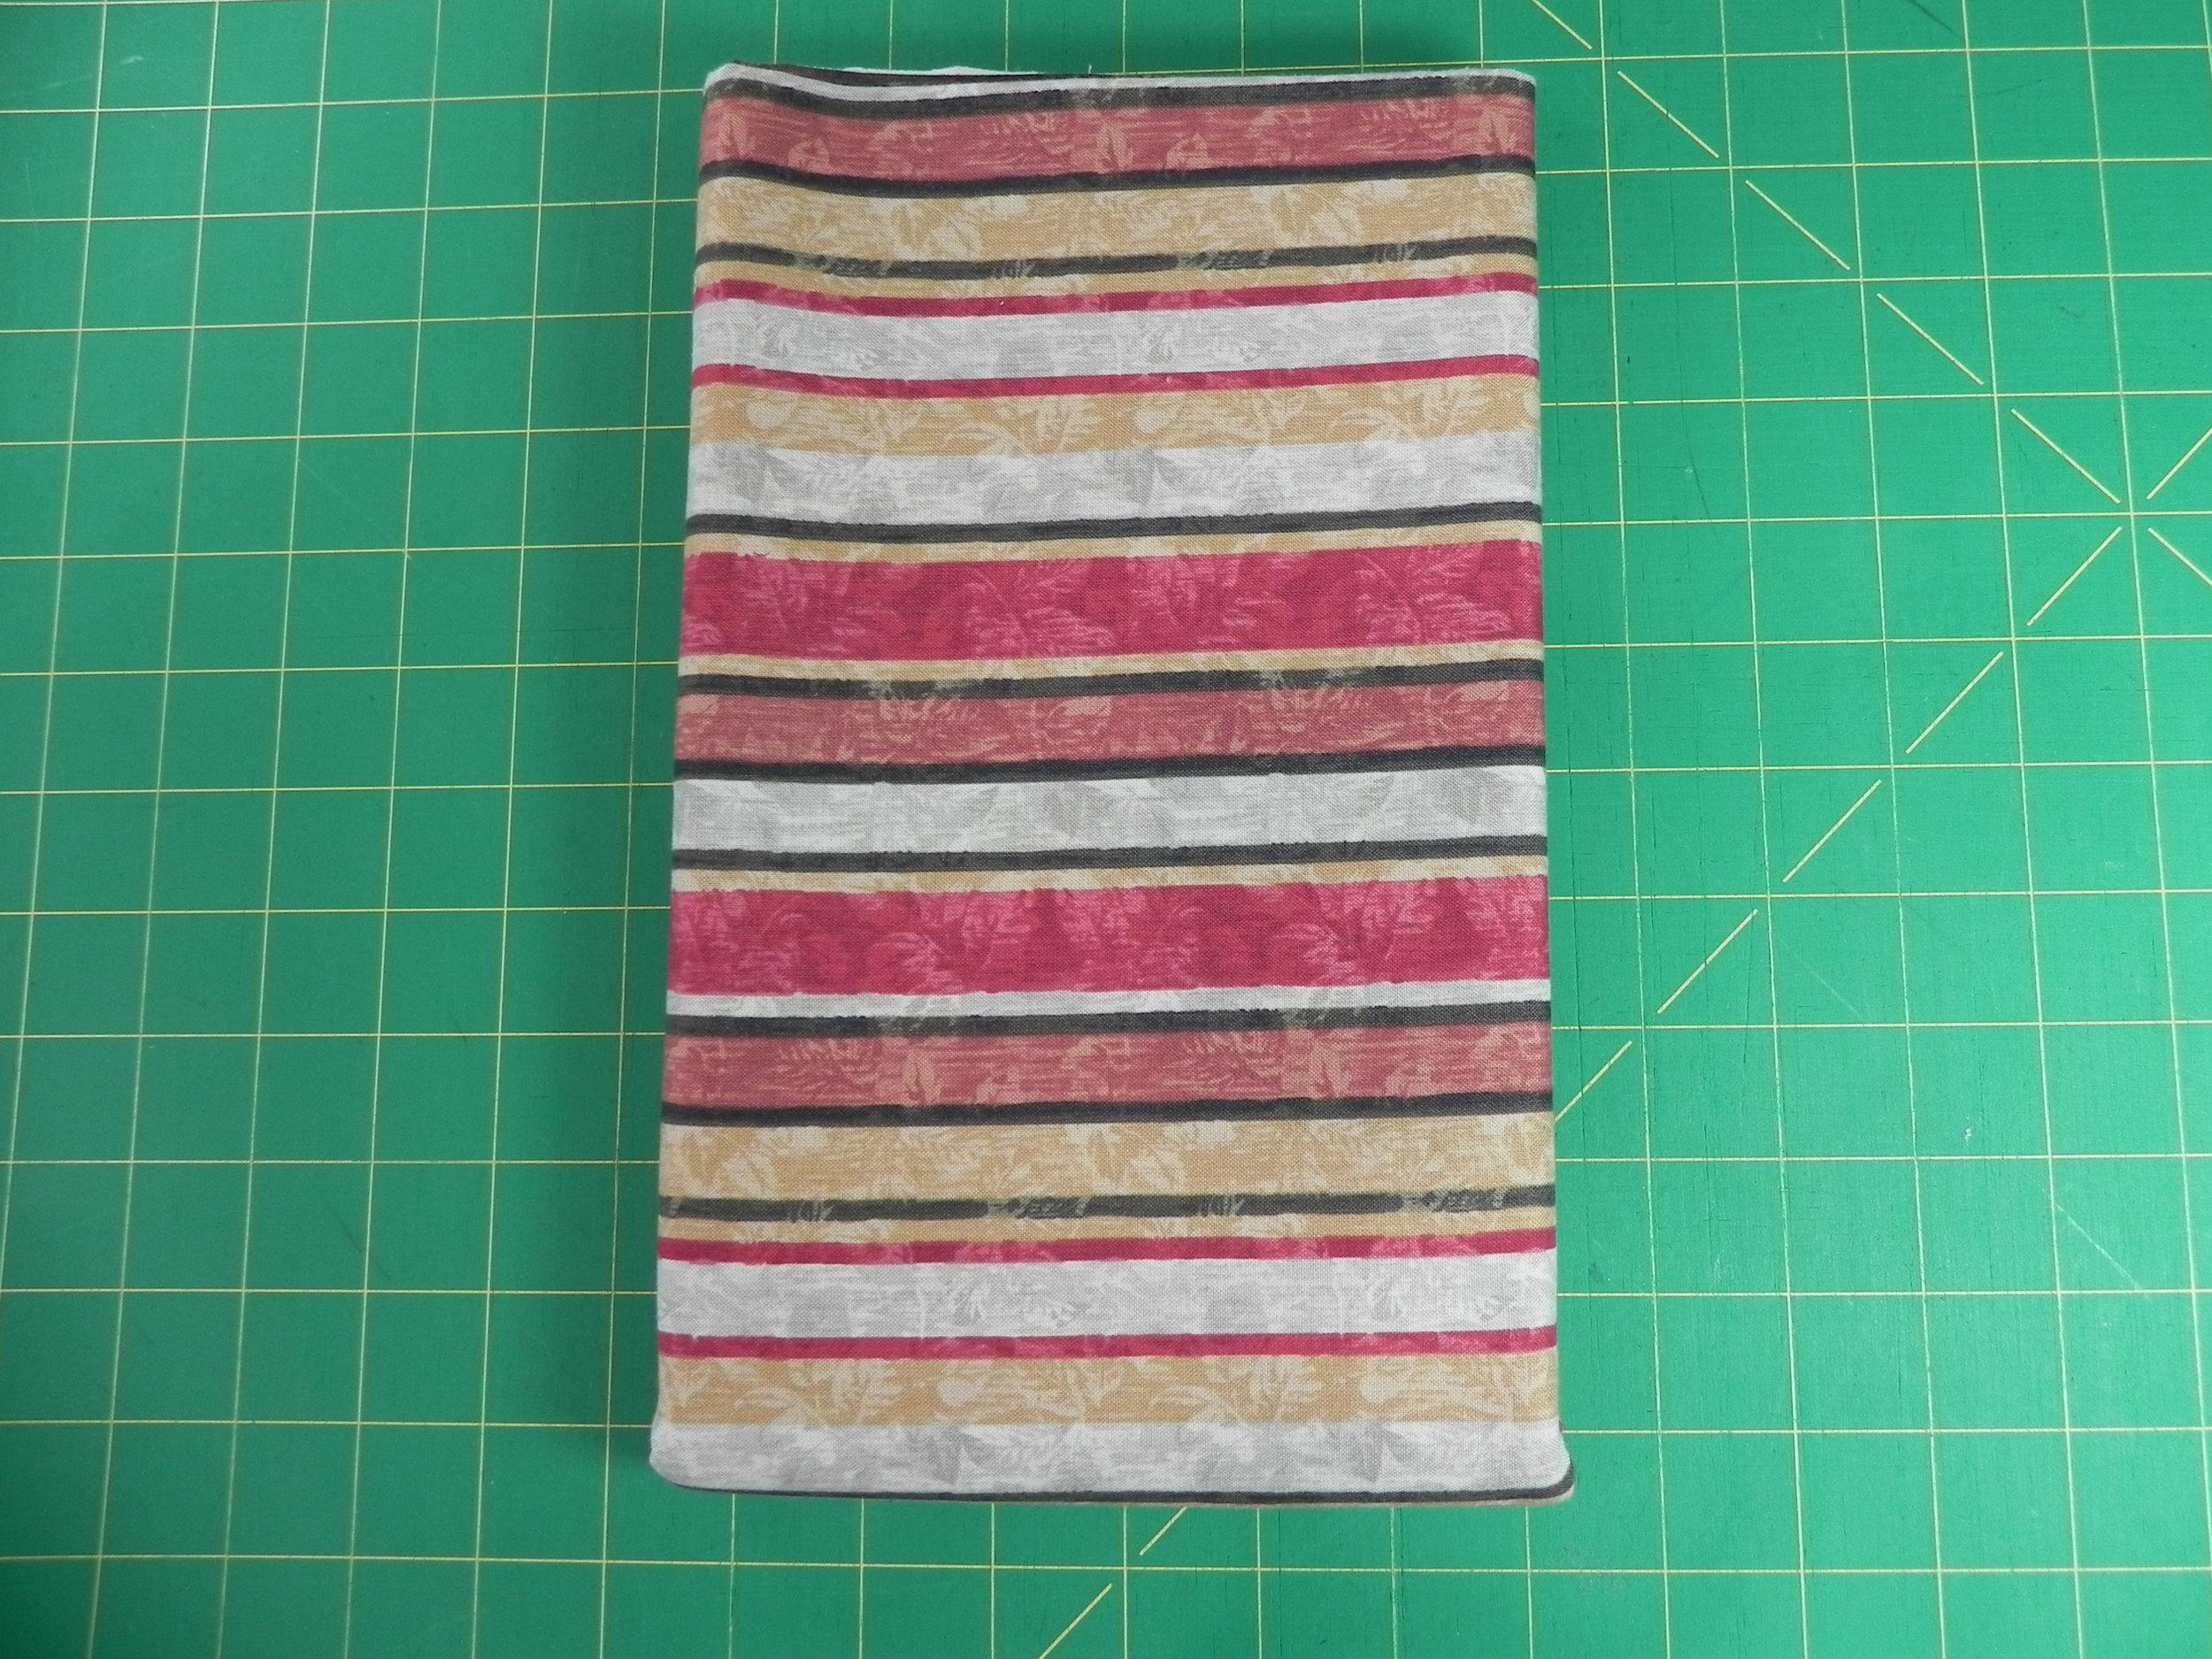 Prize #3: 2 yards stripe